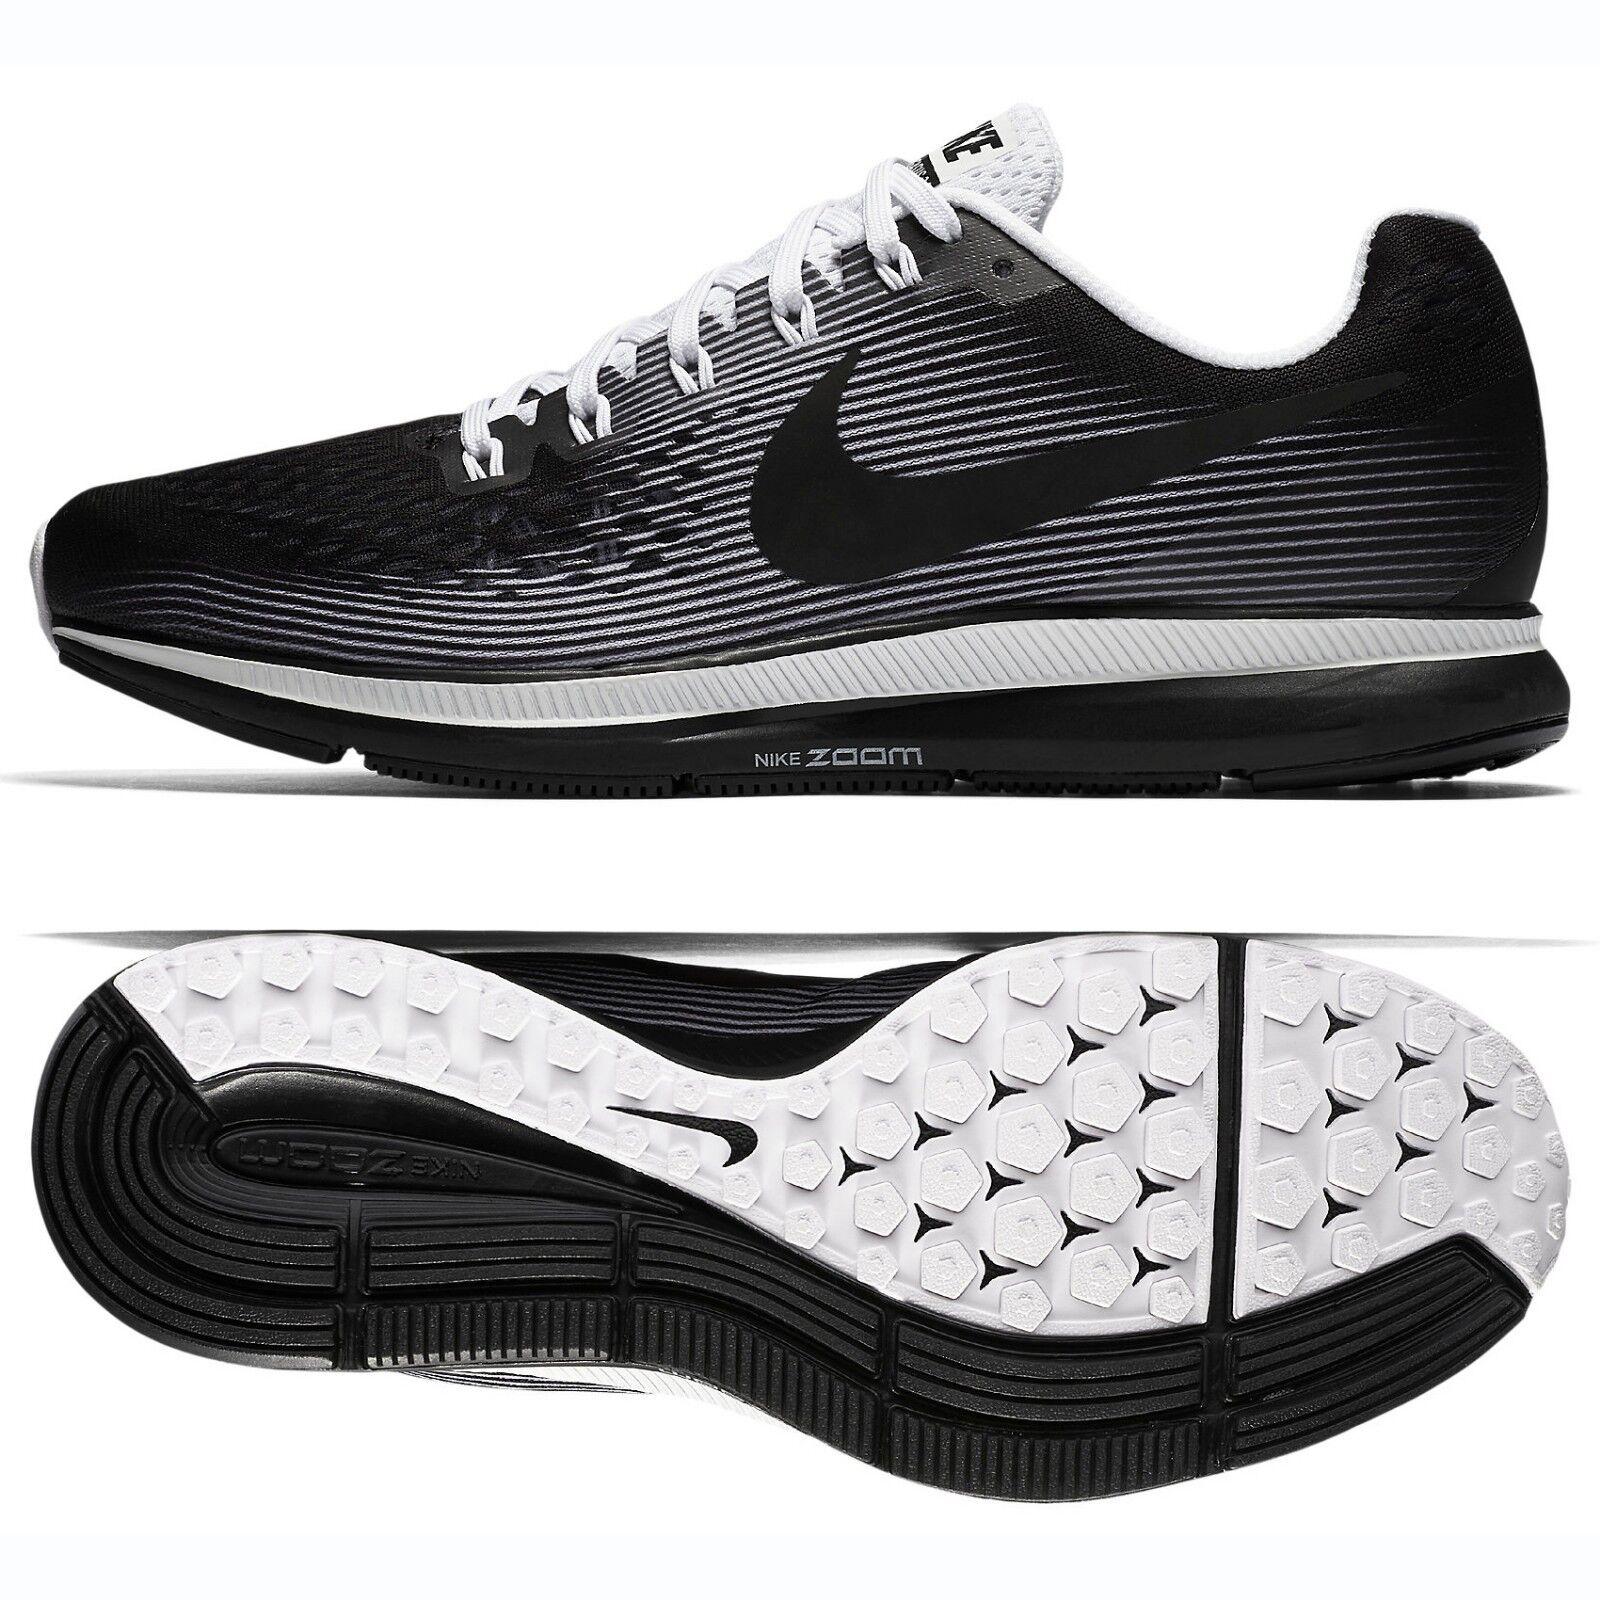 Nike Air Zoom Pegasus 34 LE 883268-001 Black/White Men's Running Shoes